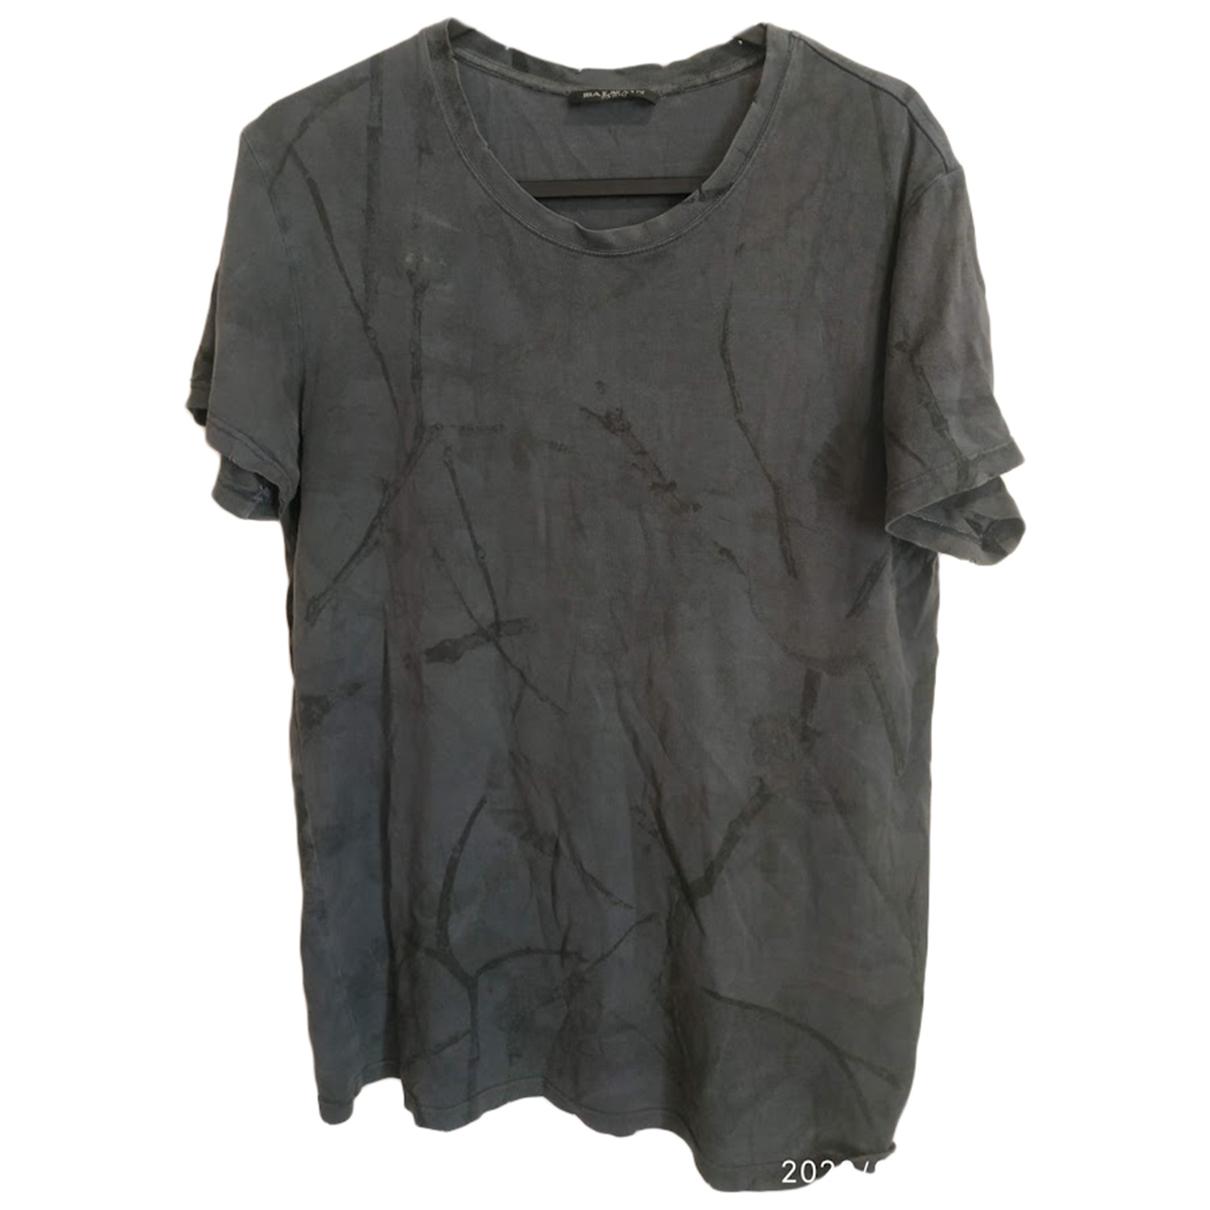 Balmain - Tee shirts   pour homme en coton - gris